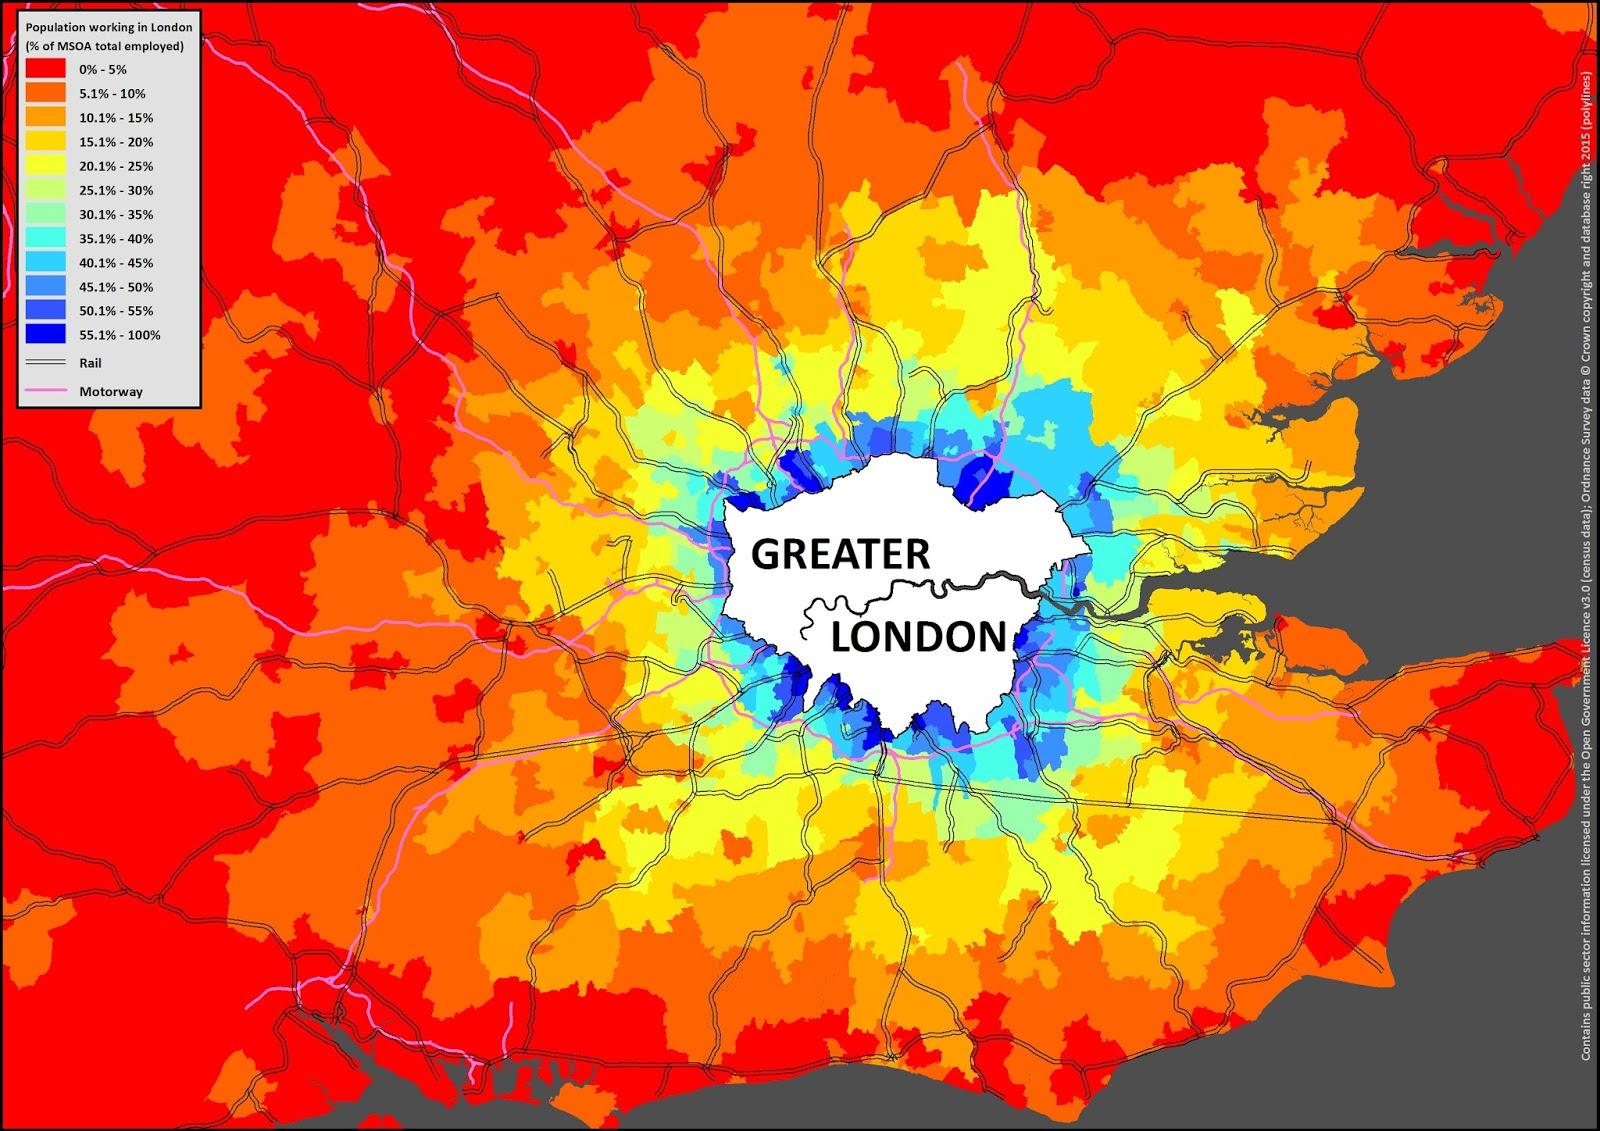 Population working in London